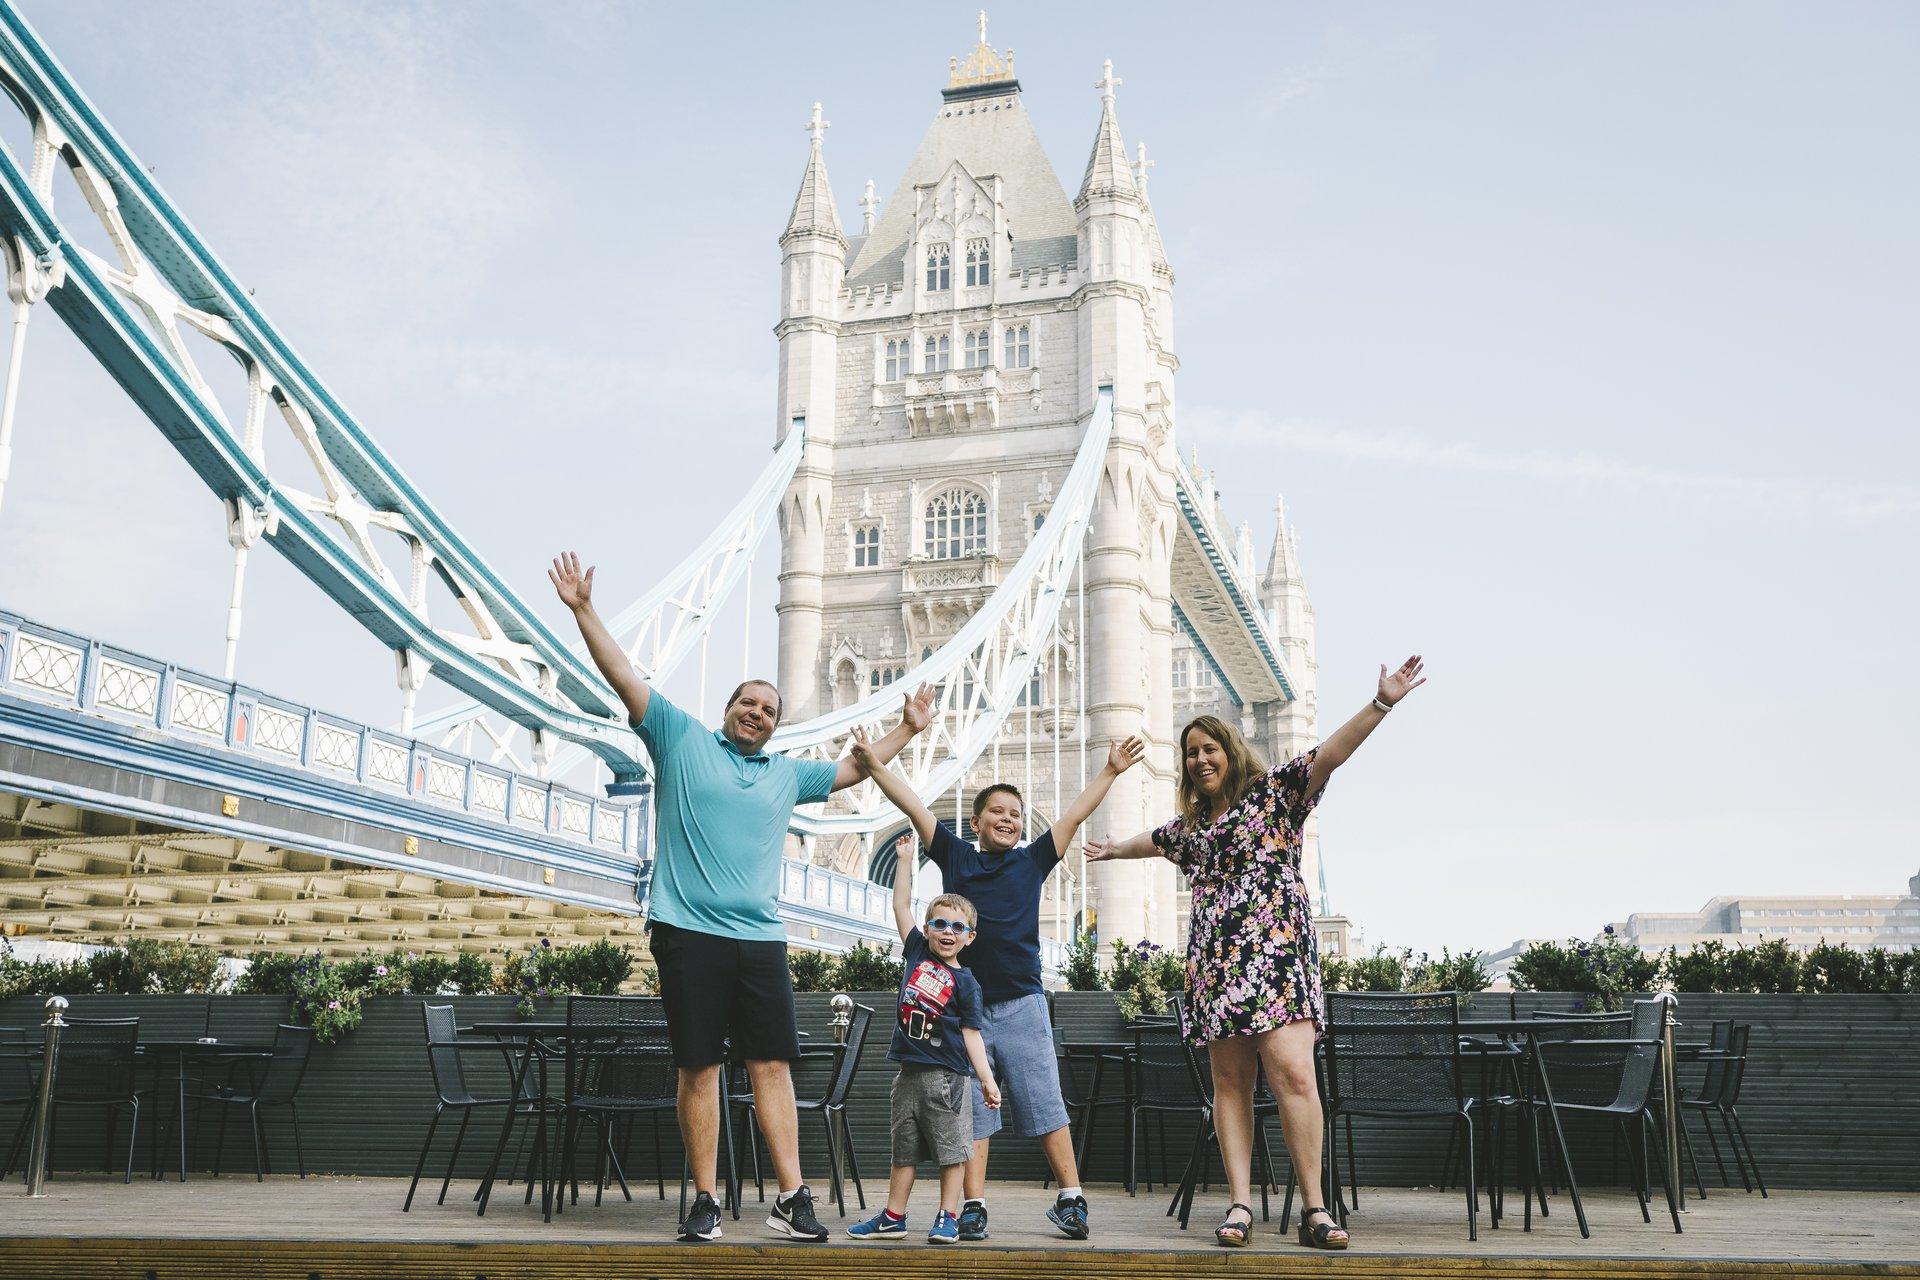 London-UK-travel-story-Flytographer-16